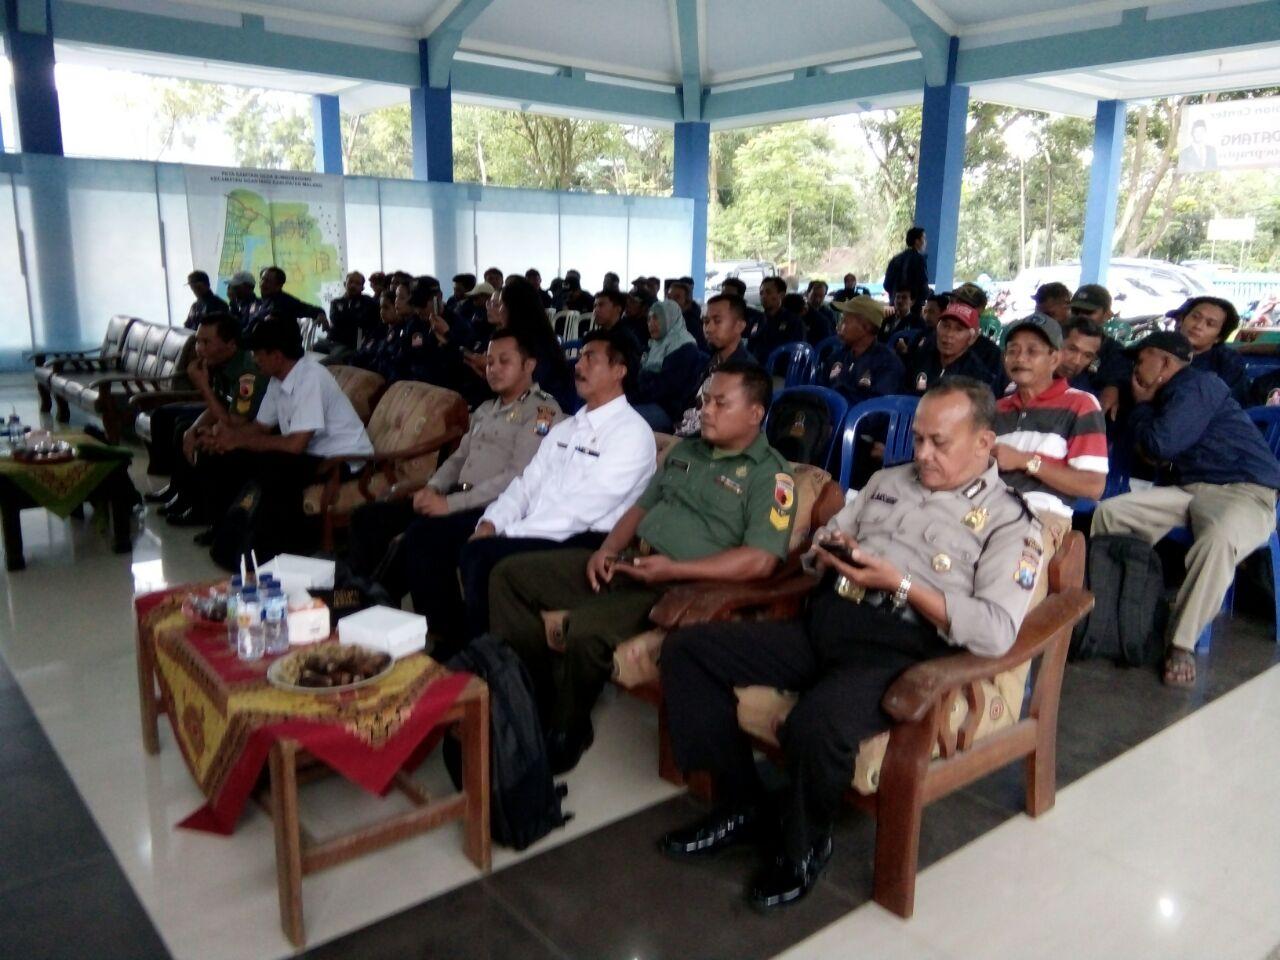 Anggota Polsek Ngantang Polres Batu Laksanakan Patroli Tatap Muka Kunjungan Kerja Anggota DPR